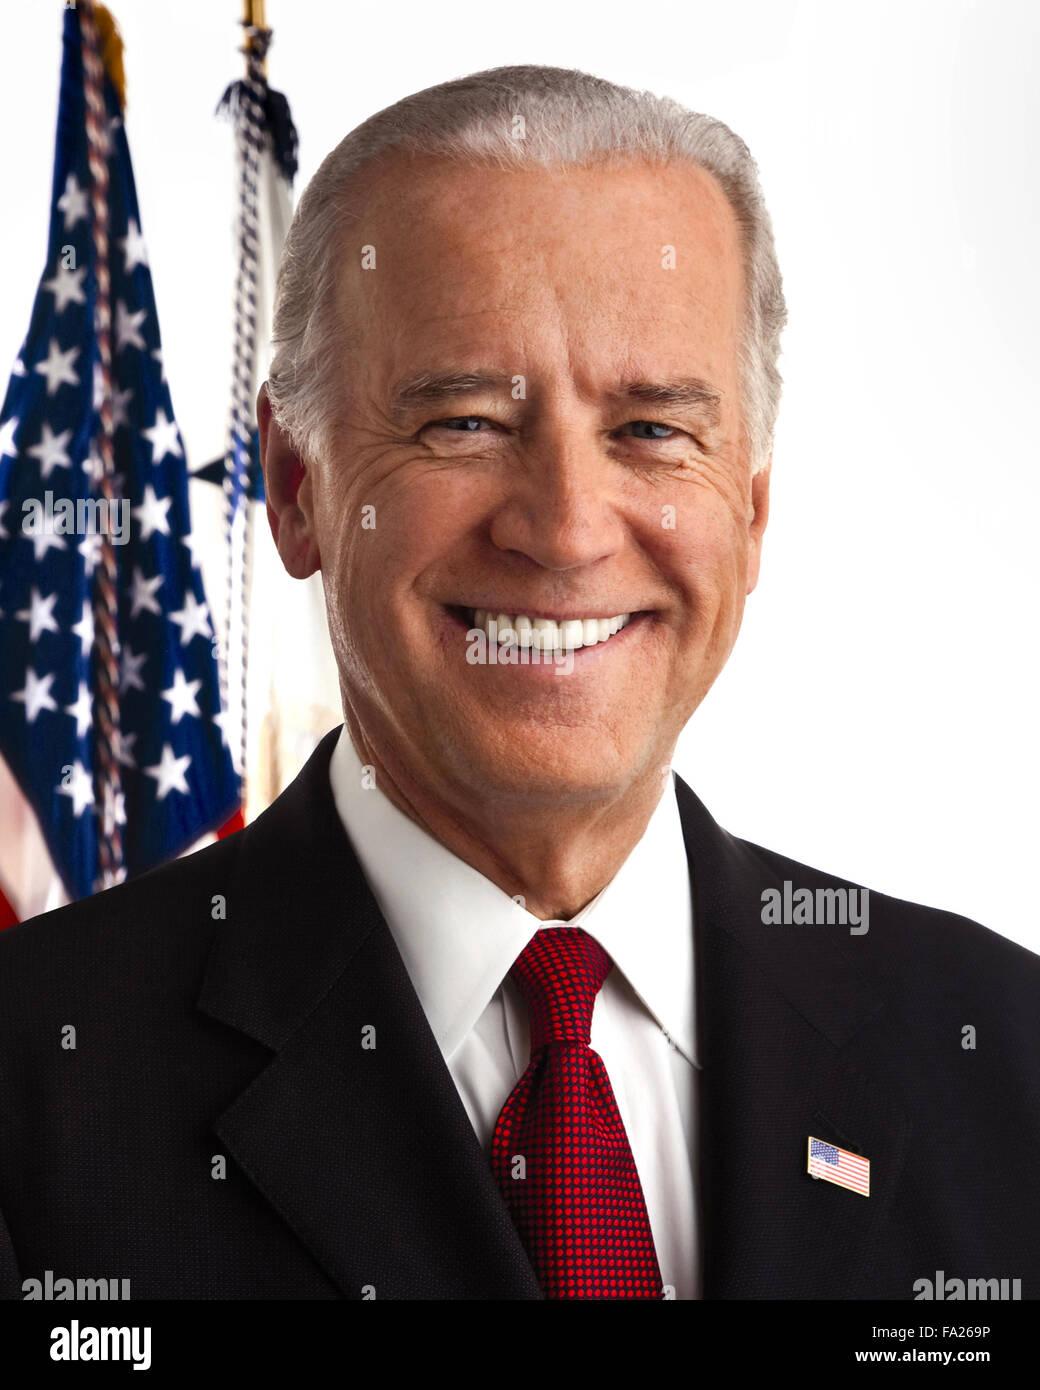 Joseph Robinette 'Joe' Biden, Jr. American politician who is the 47th Vice President of the United States. - Stock Image